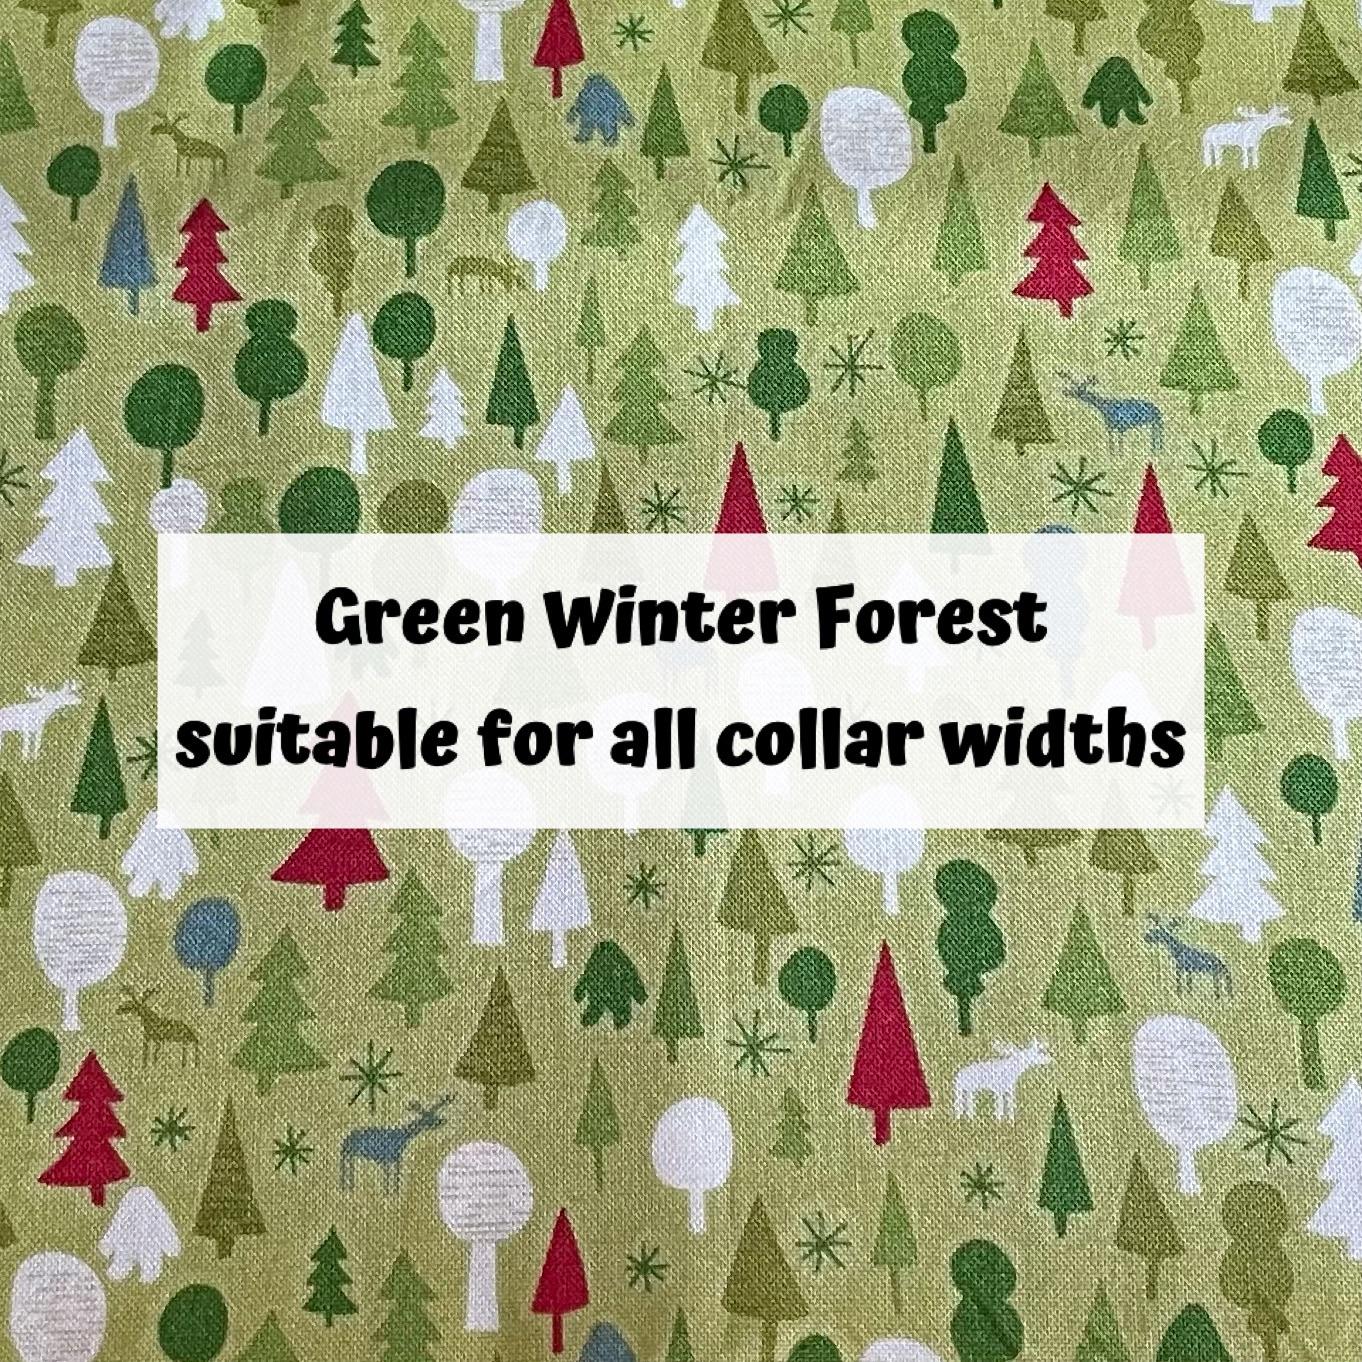 Green Winter Forest